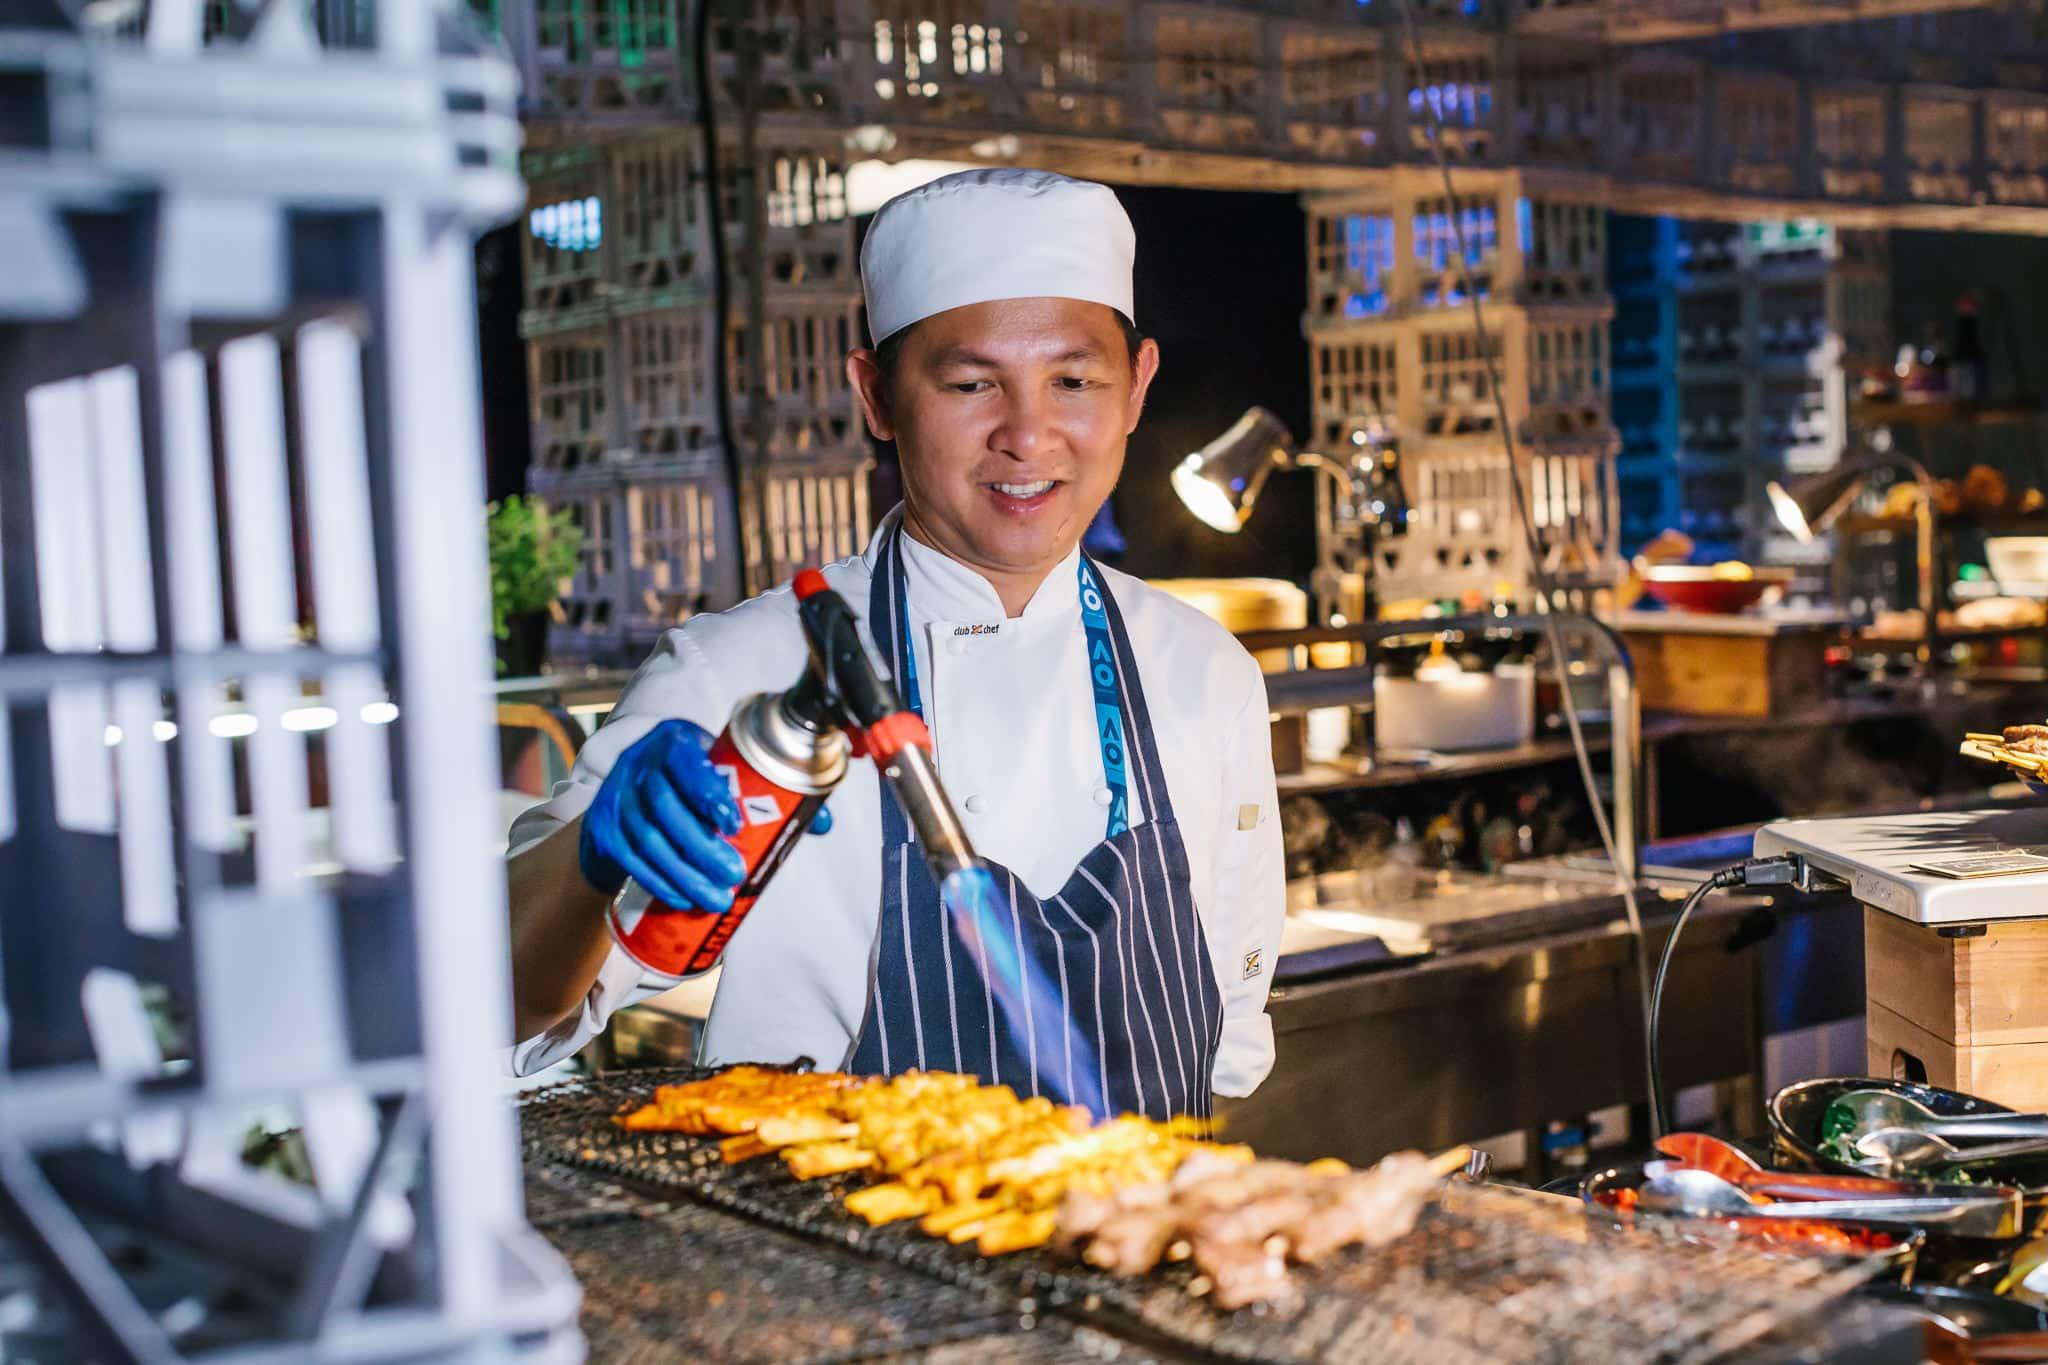 preparing food at events